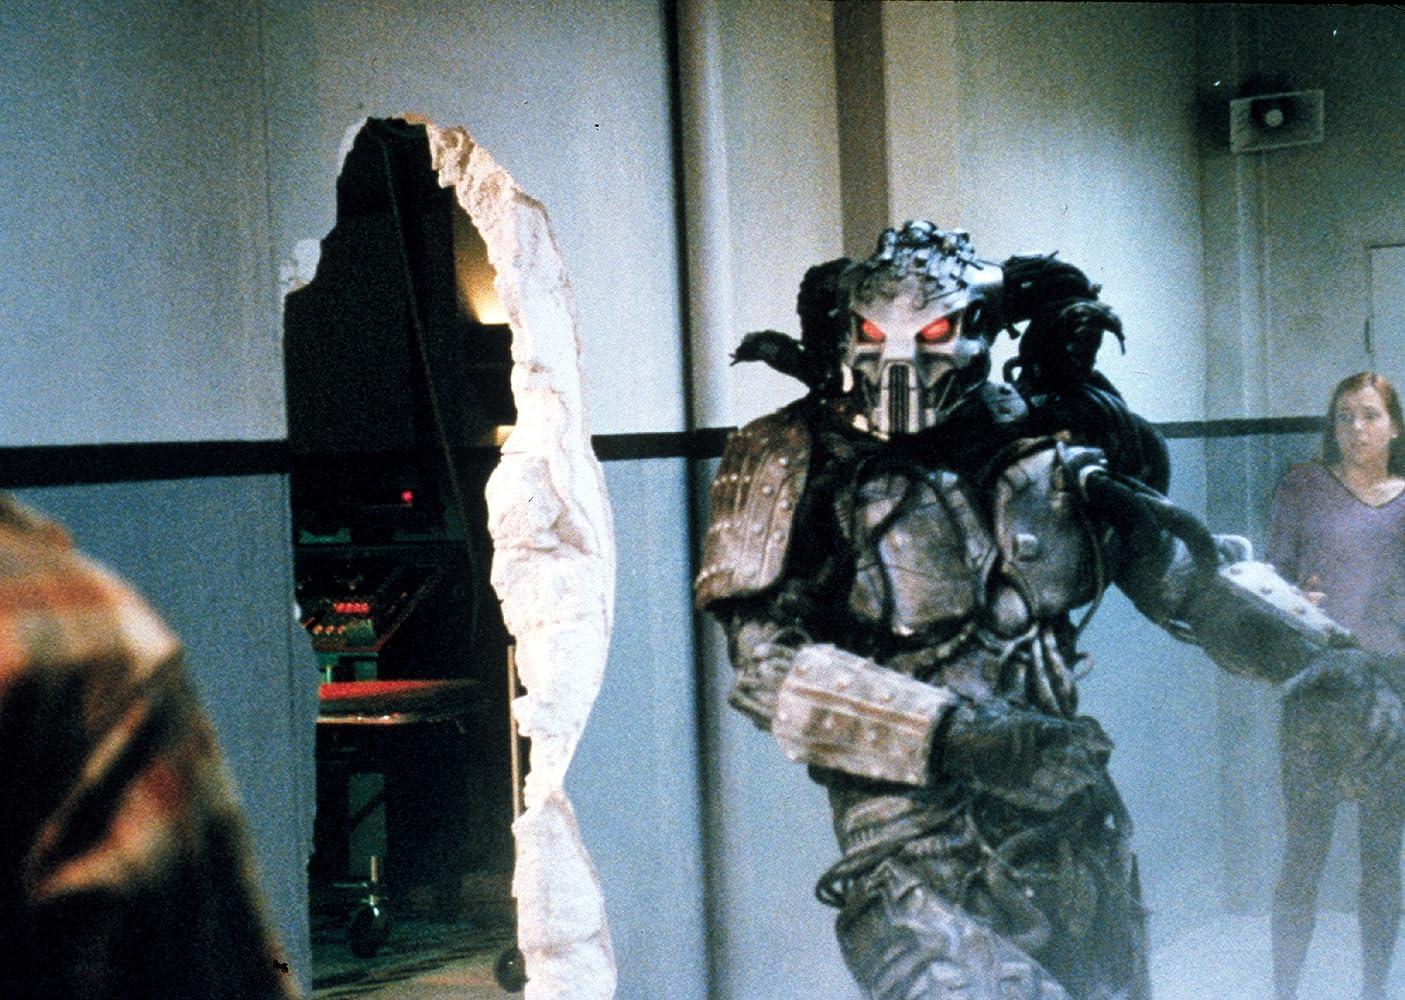 & I Robot... You Jane (1997)